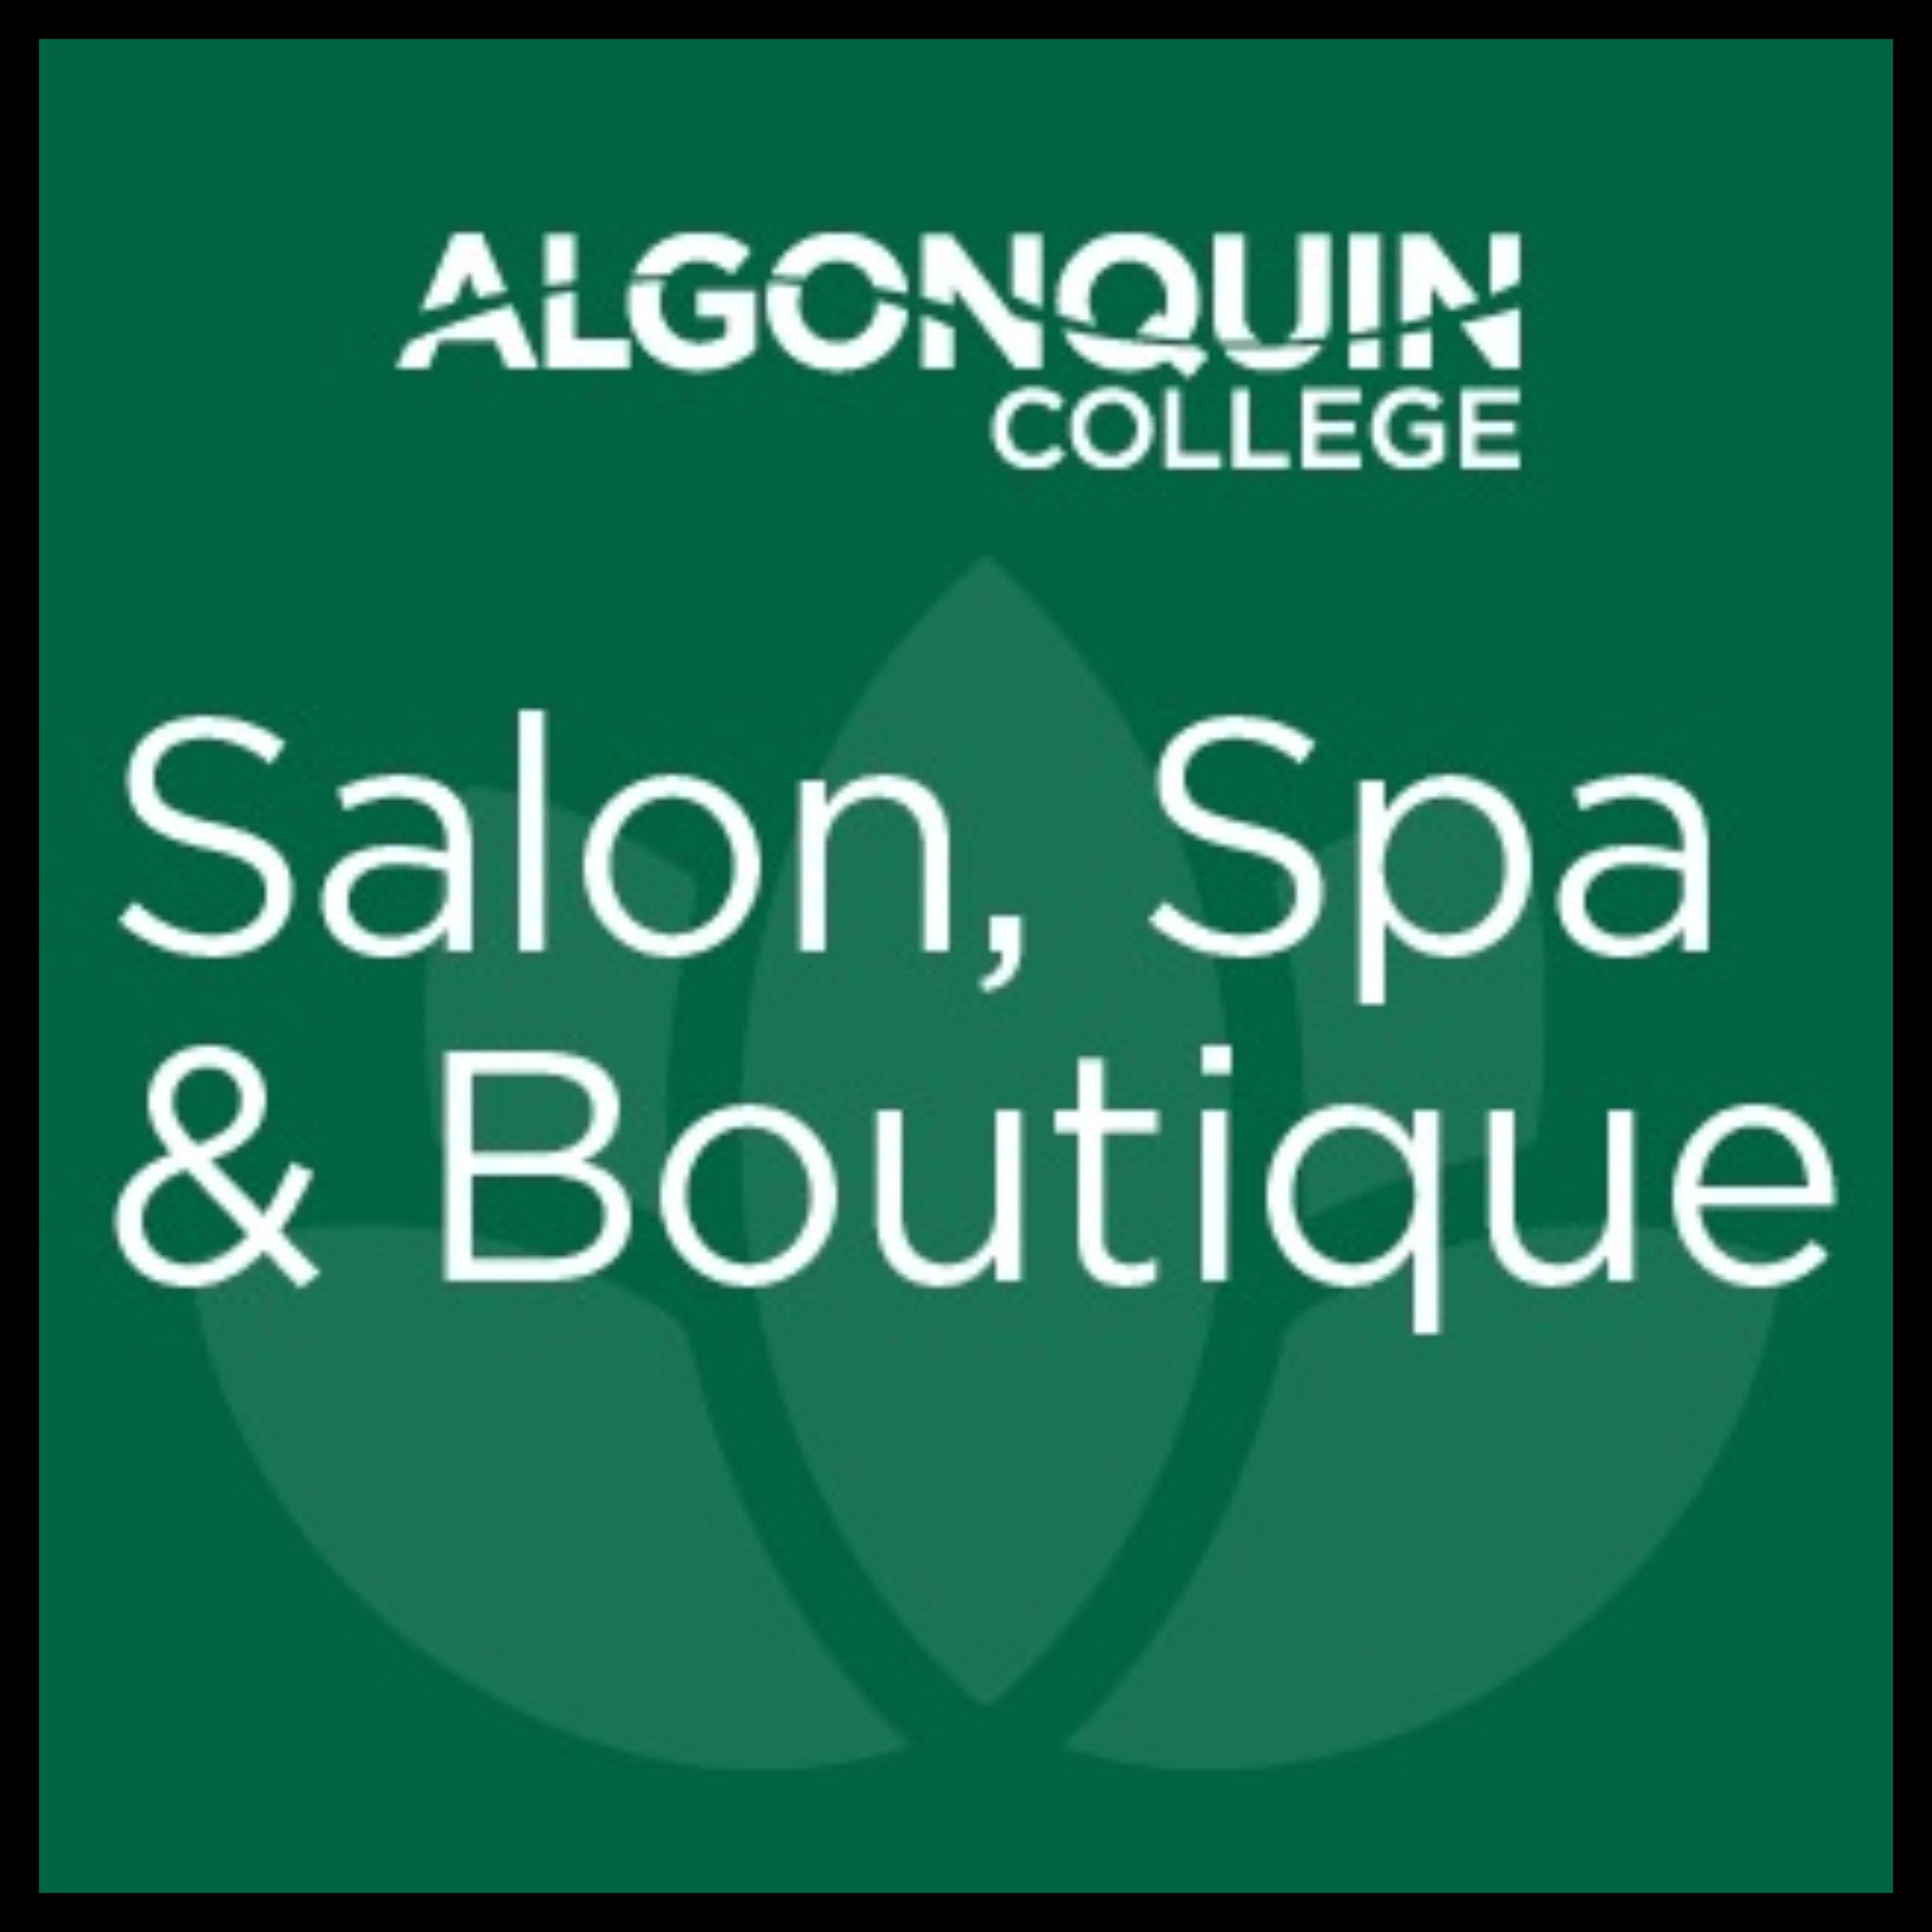 Beehive Venue Sponsor Algonquin College Salon Spa and Boutique.jpg